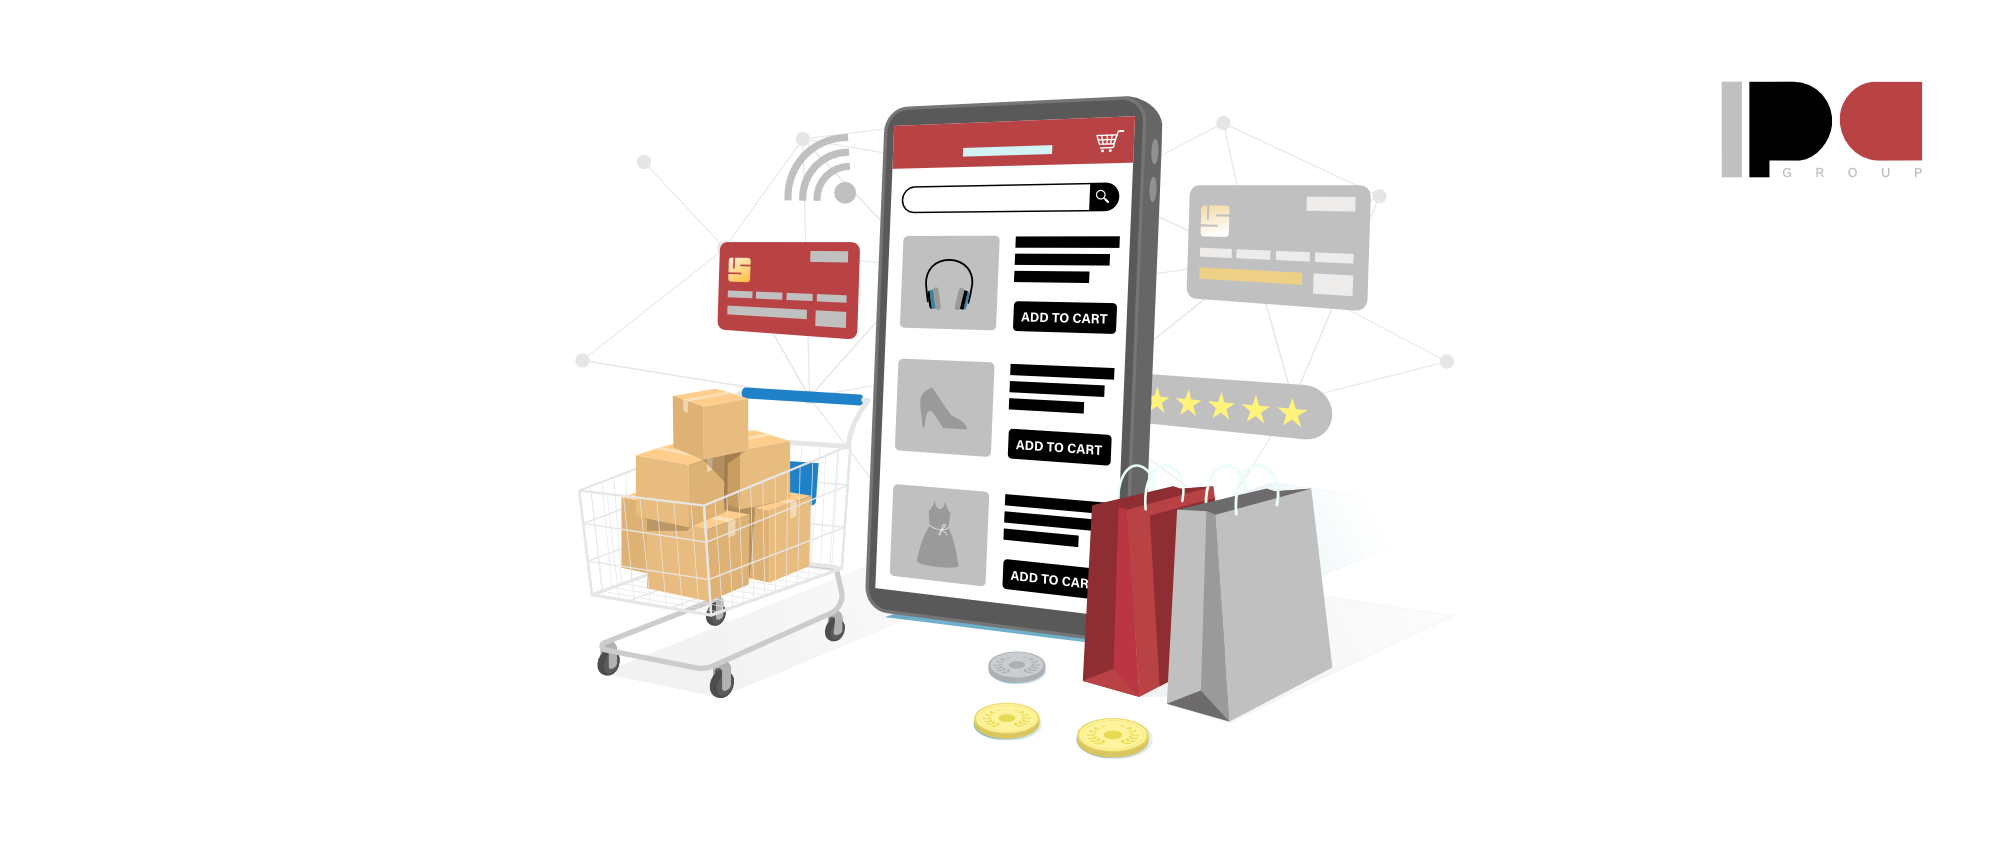 M-Commerce compras desde el movil